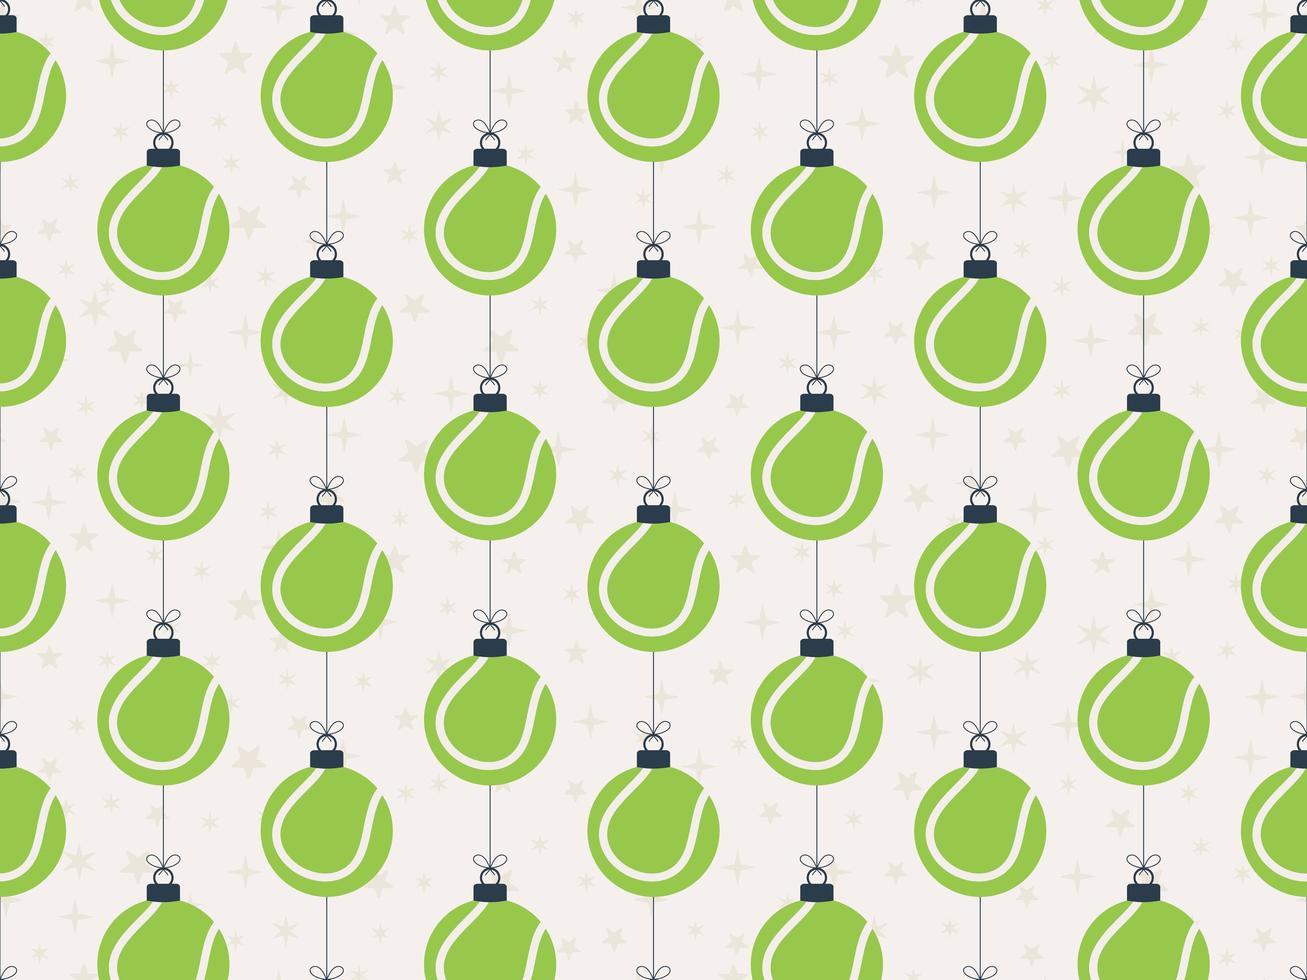 feliz natal tênis padrão horizontal sem costura vetor